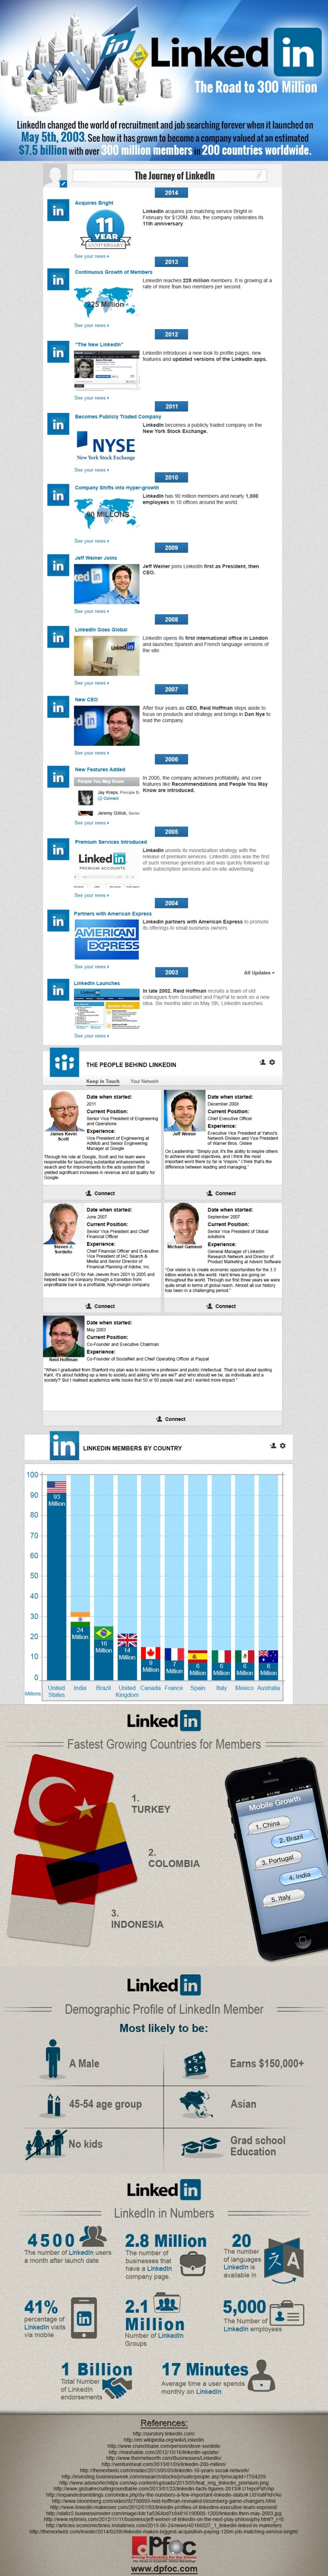 When did LinkedIn start?